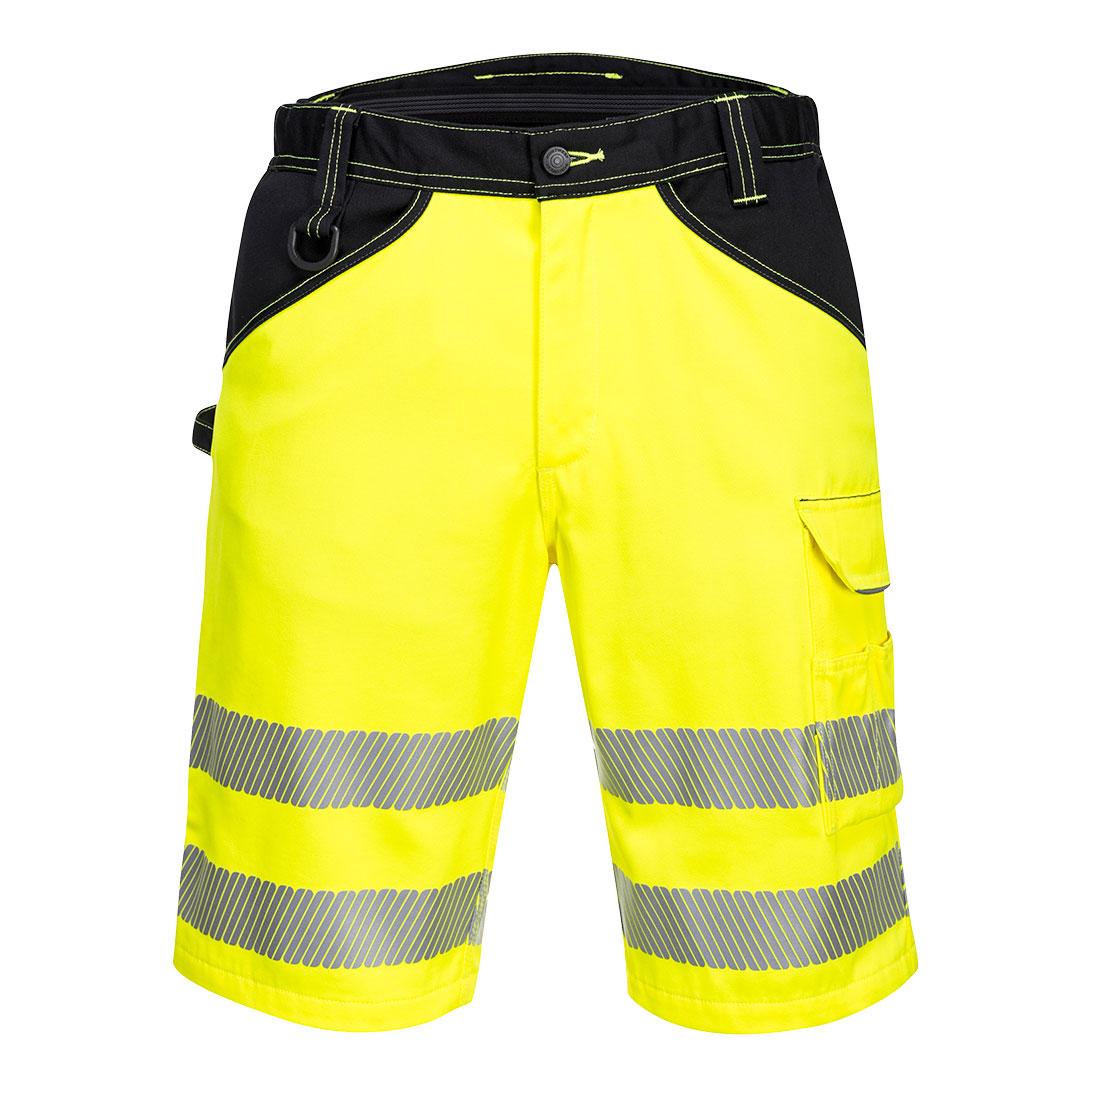 PW3 Hi-Vis Shorts Yellow/Black 34R